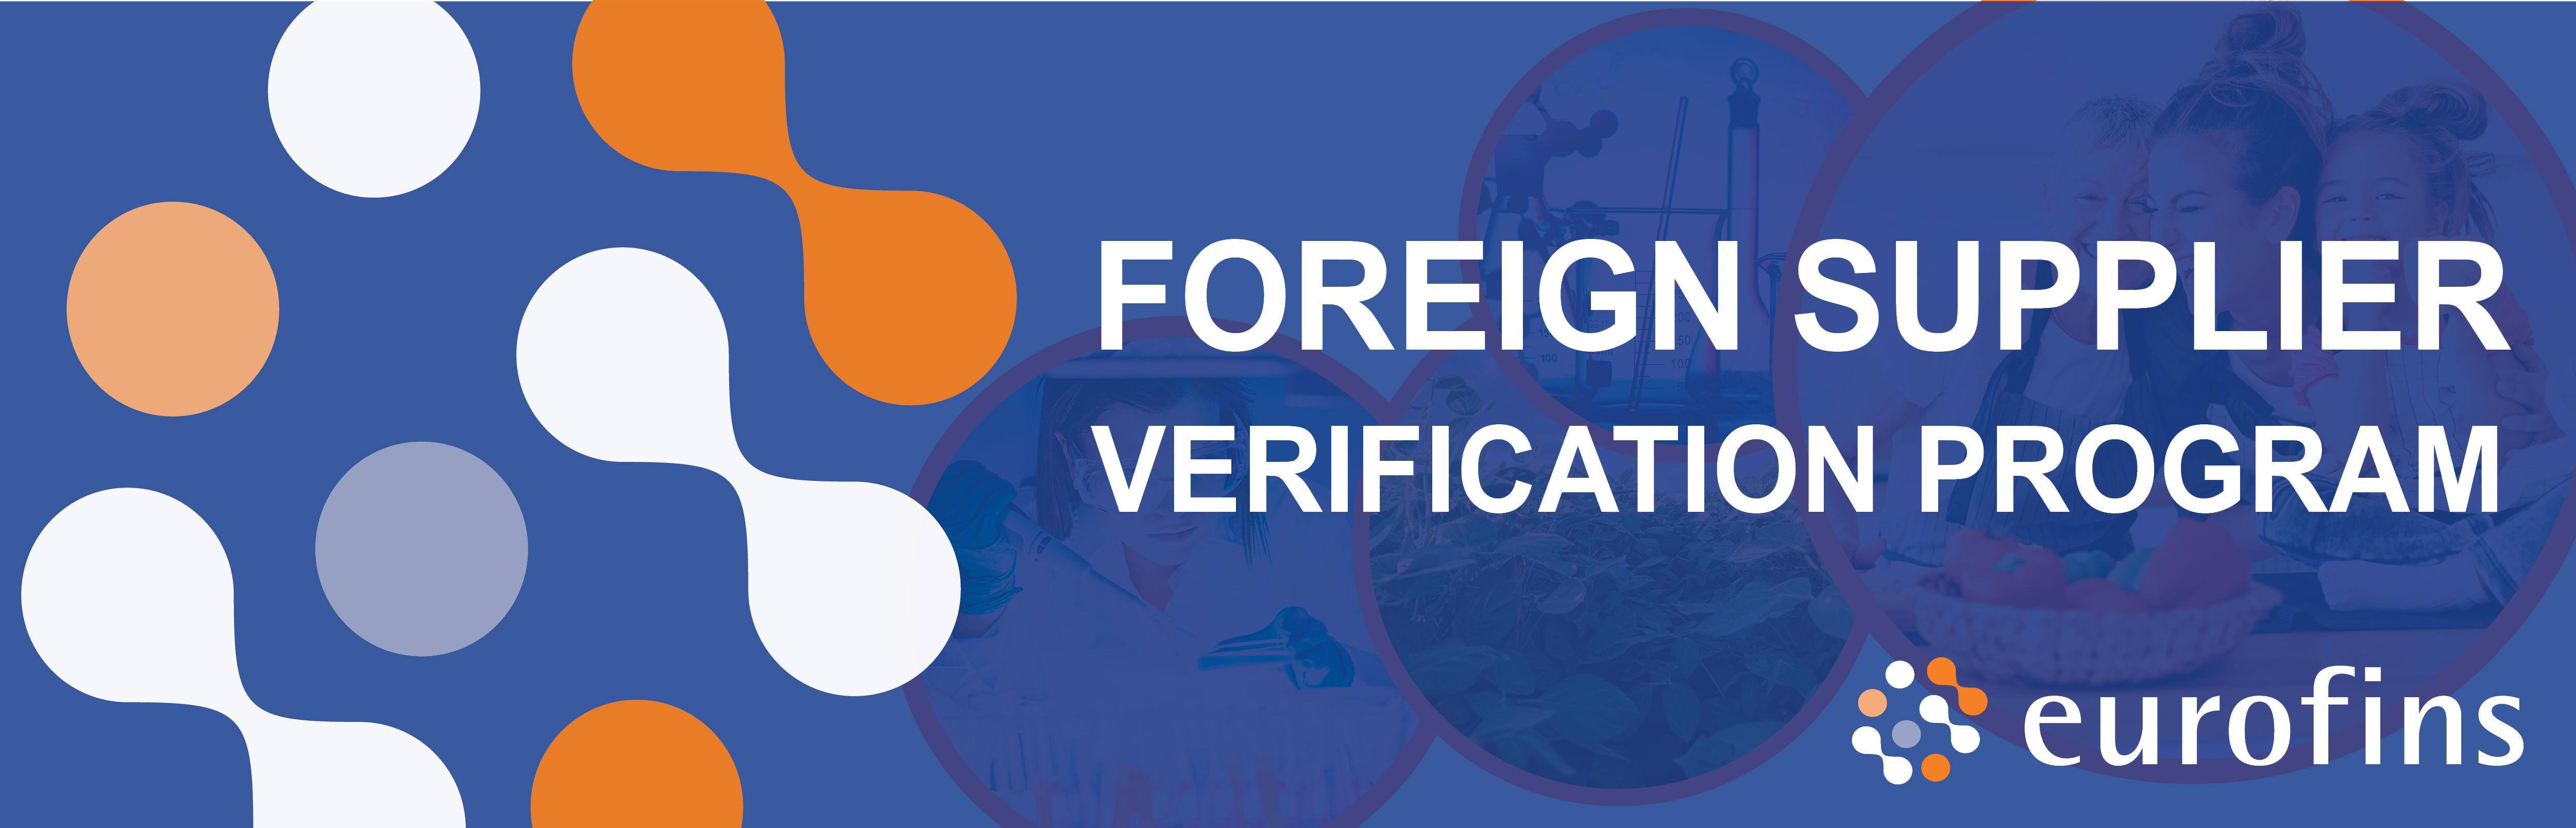 Foreign Supplier Verification Programs